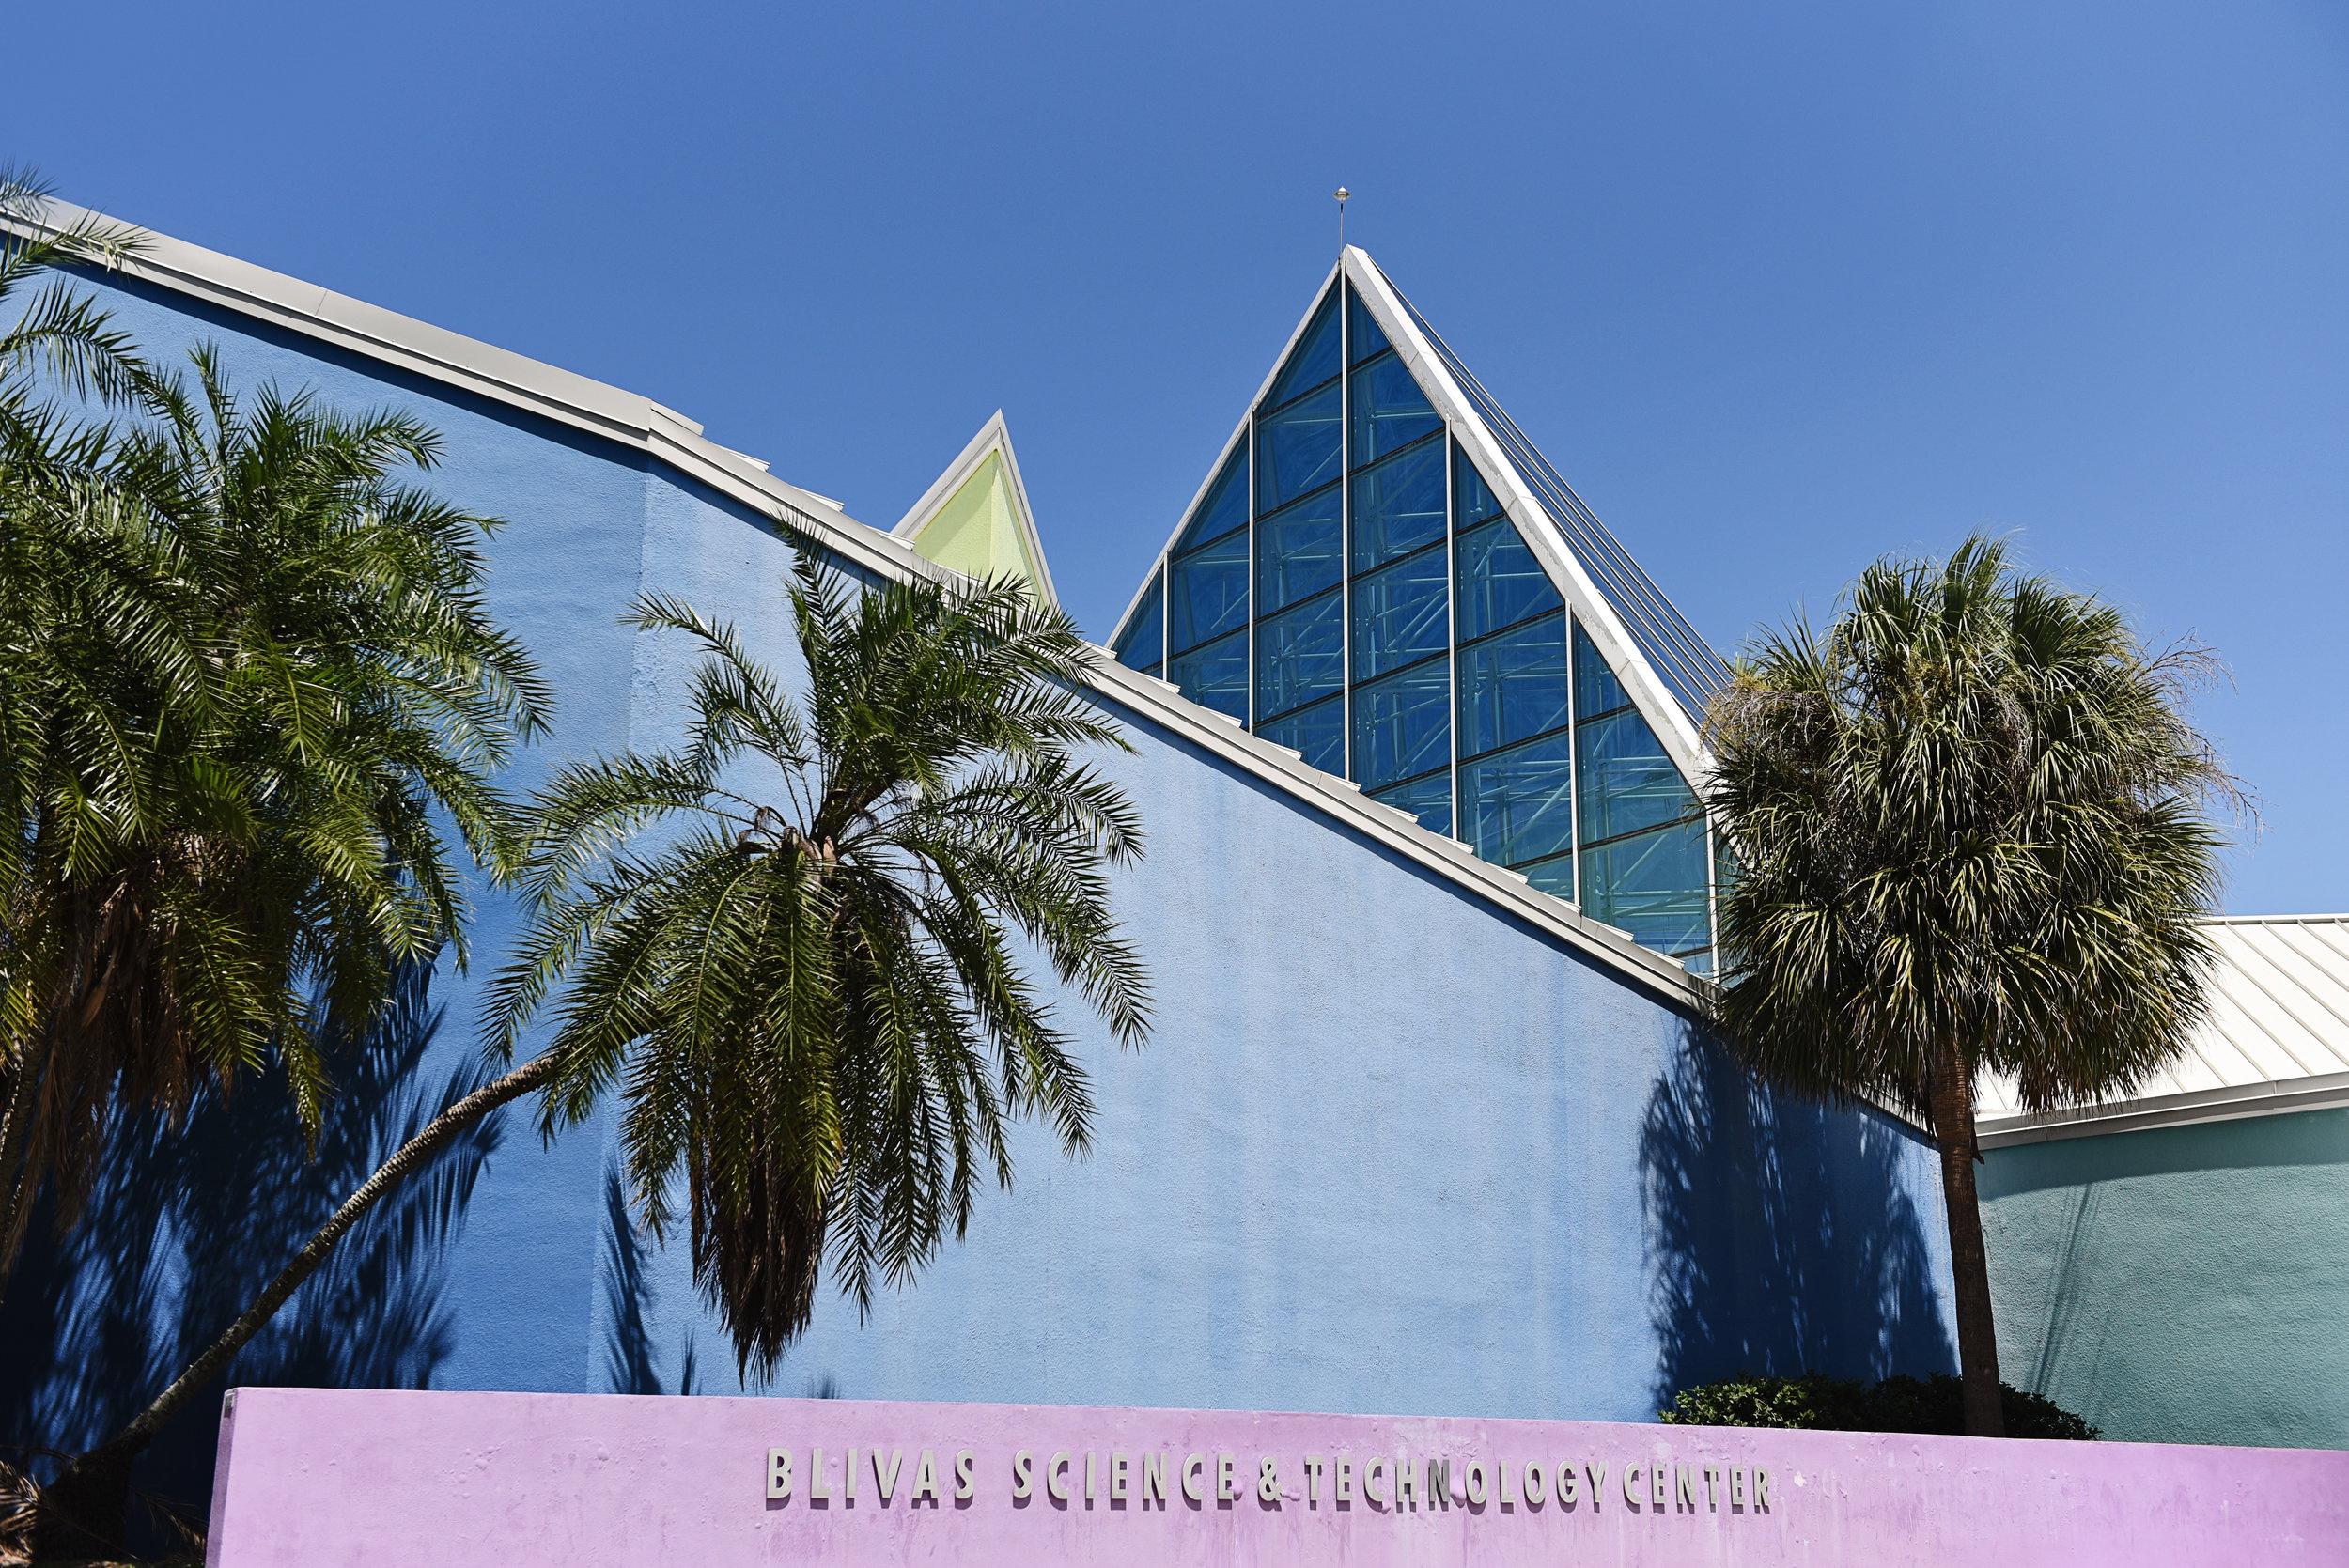 Blivas Science & Technology Center designed by Walter Netsch (SOM)